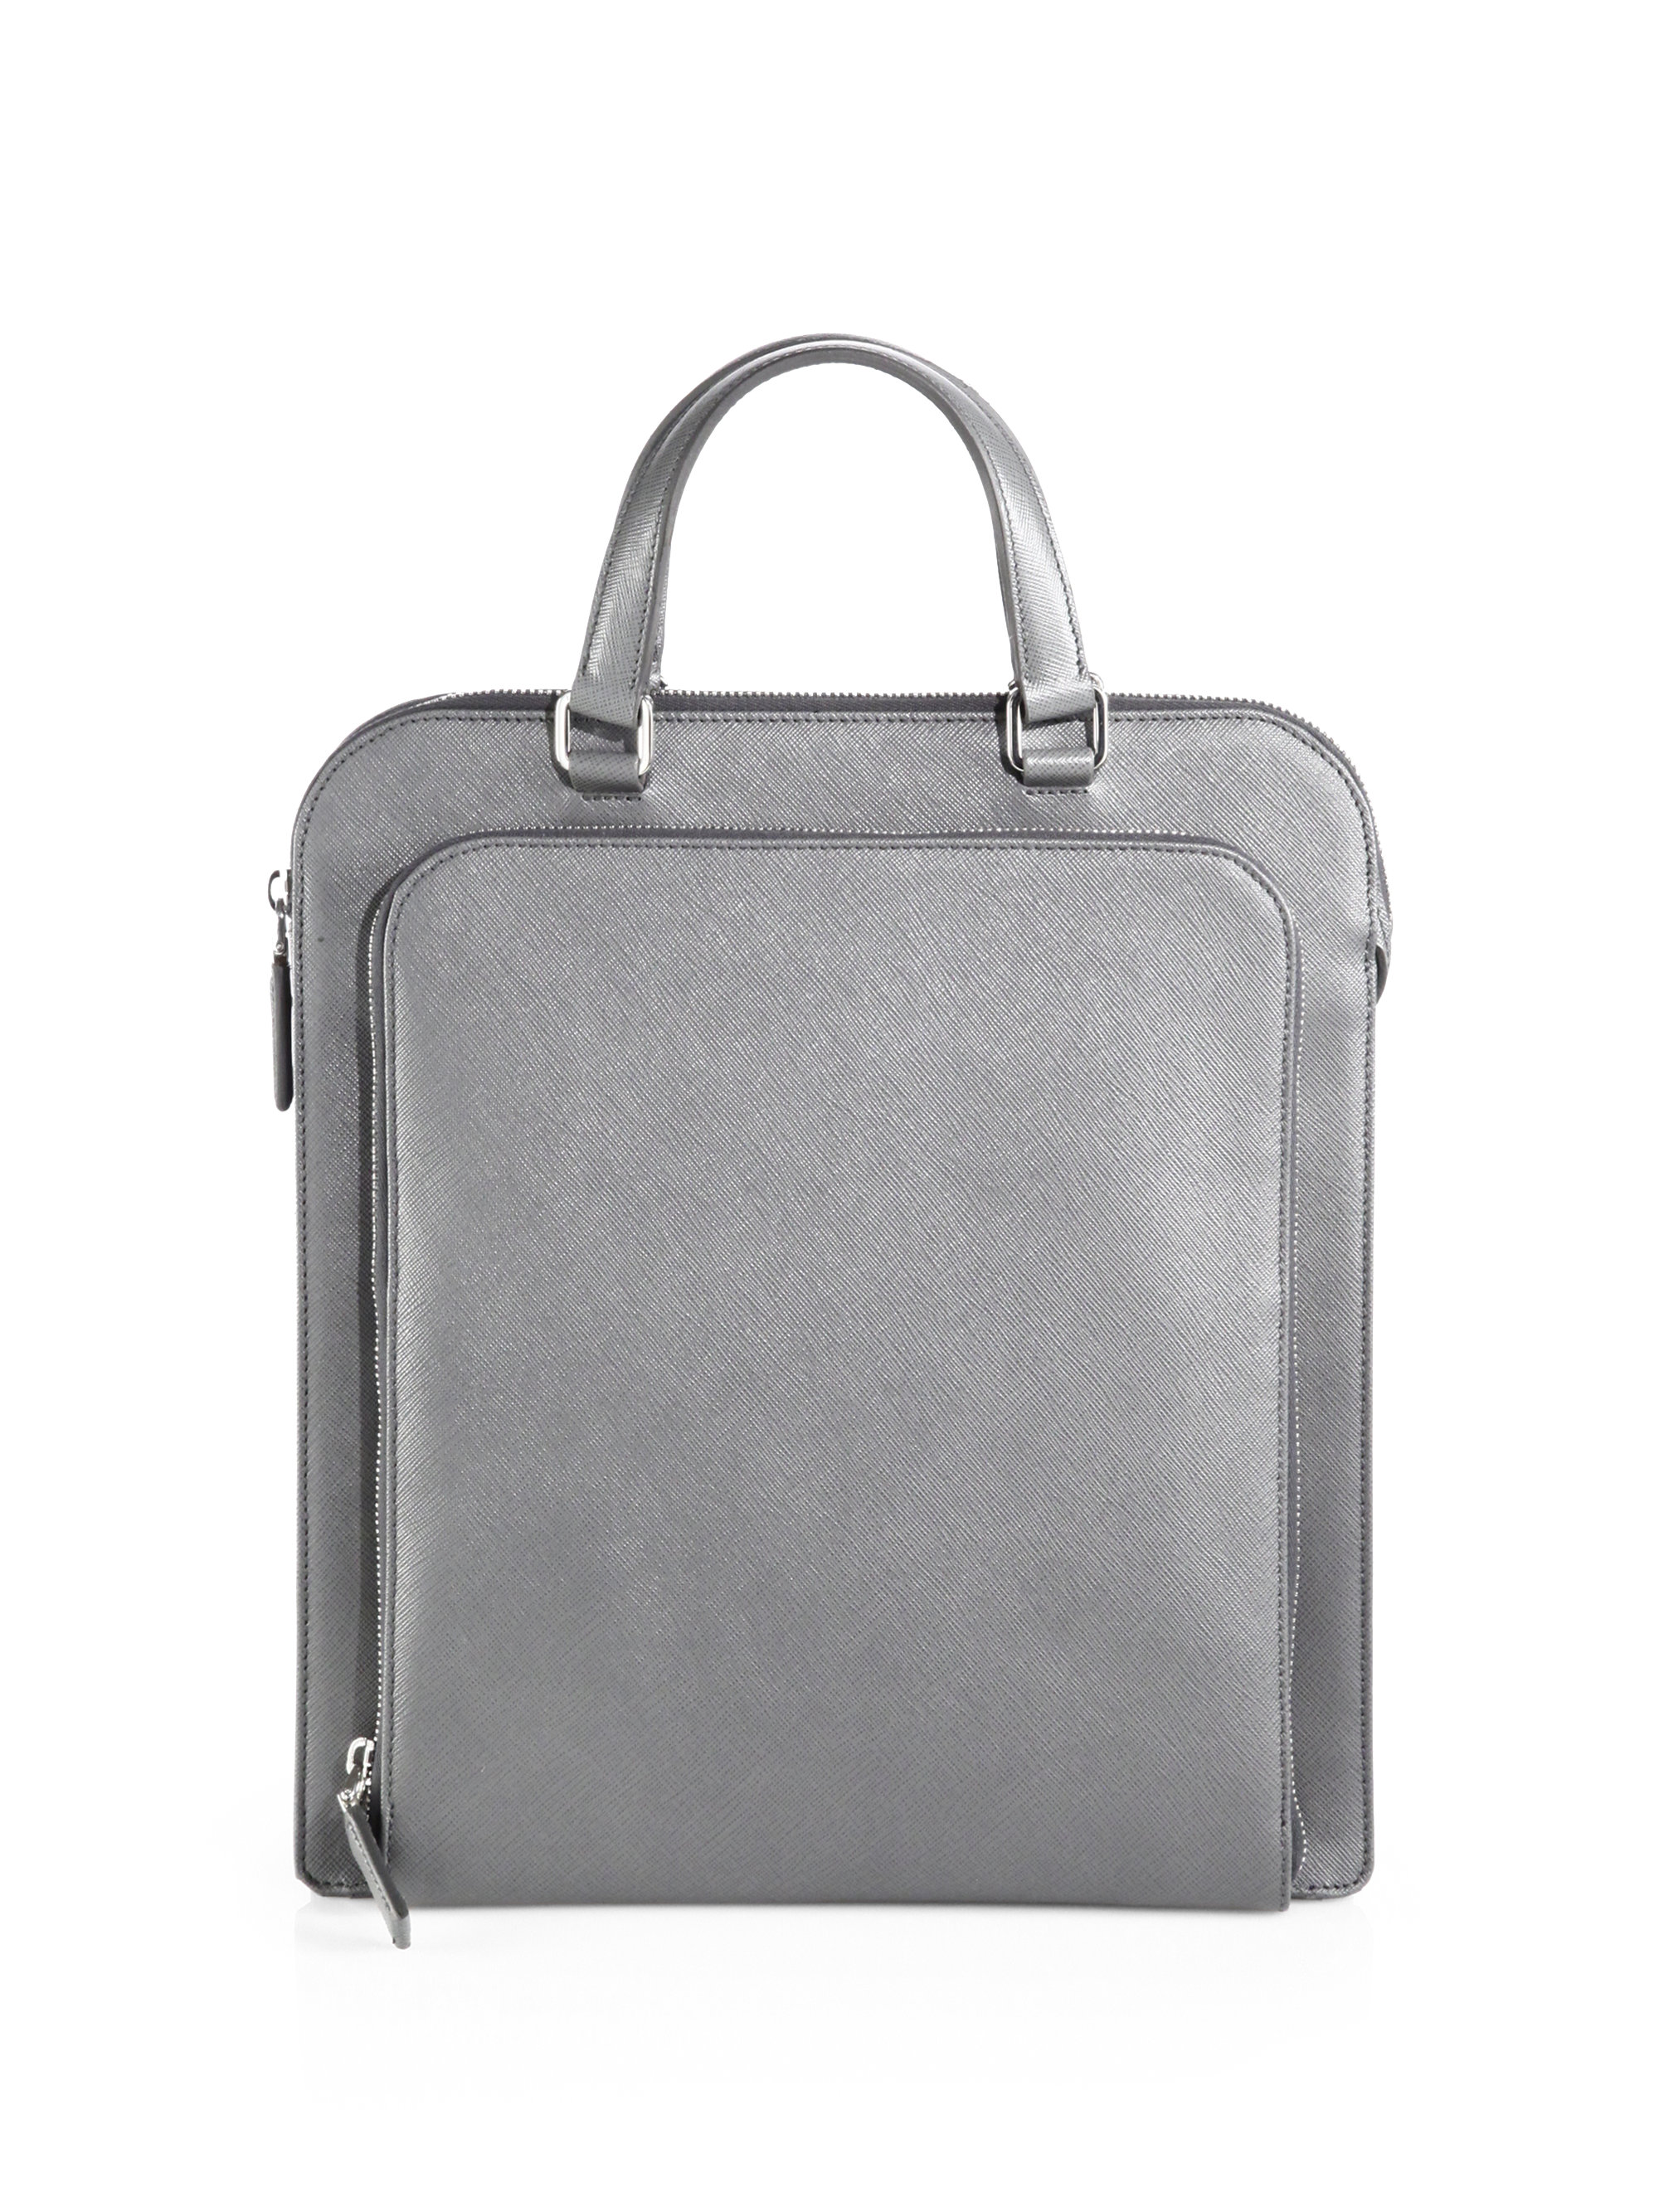 93c37f9b789 ... best lyst prada saffiano travel tote in gray for men c70f1 70ebc